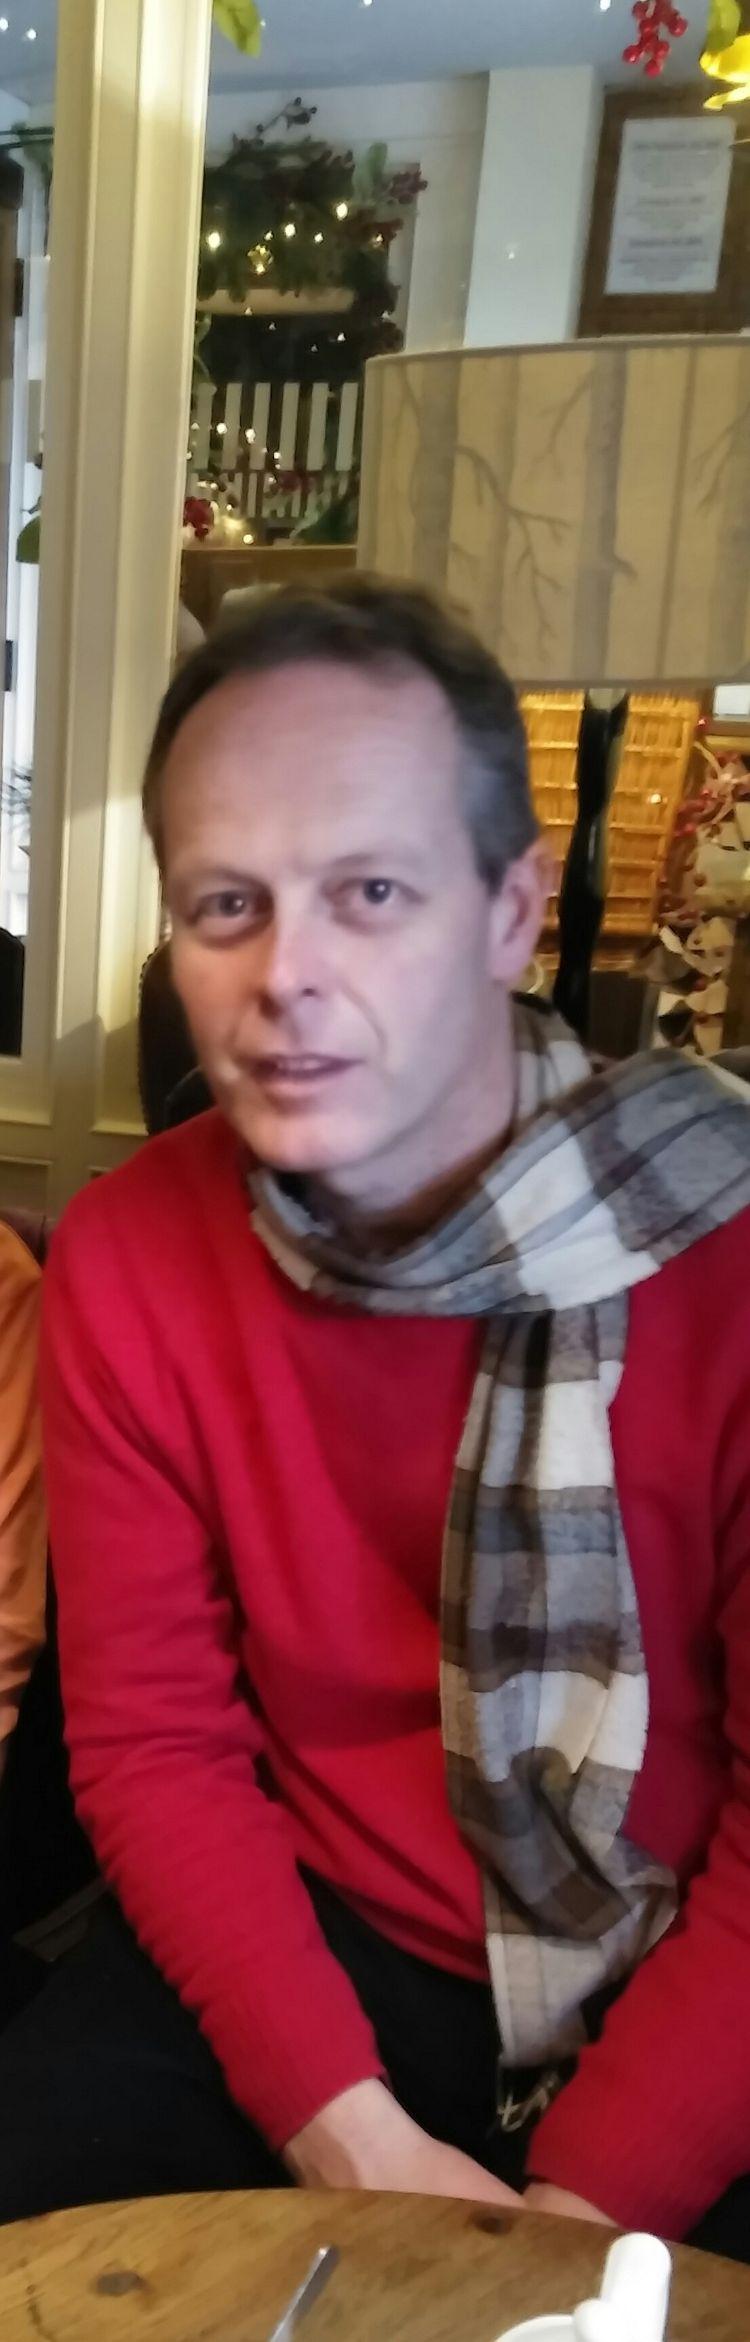 Neill December 2017